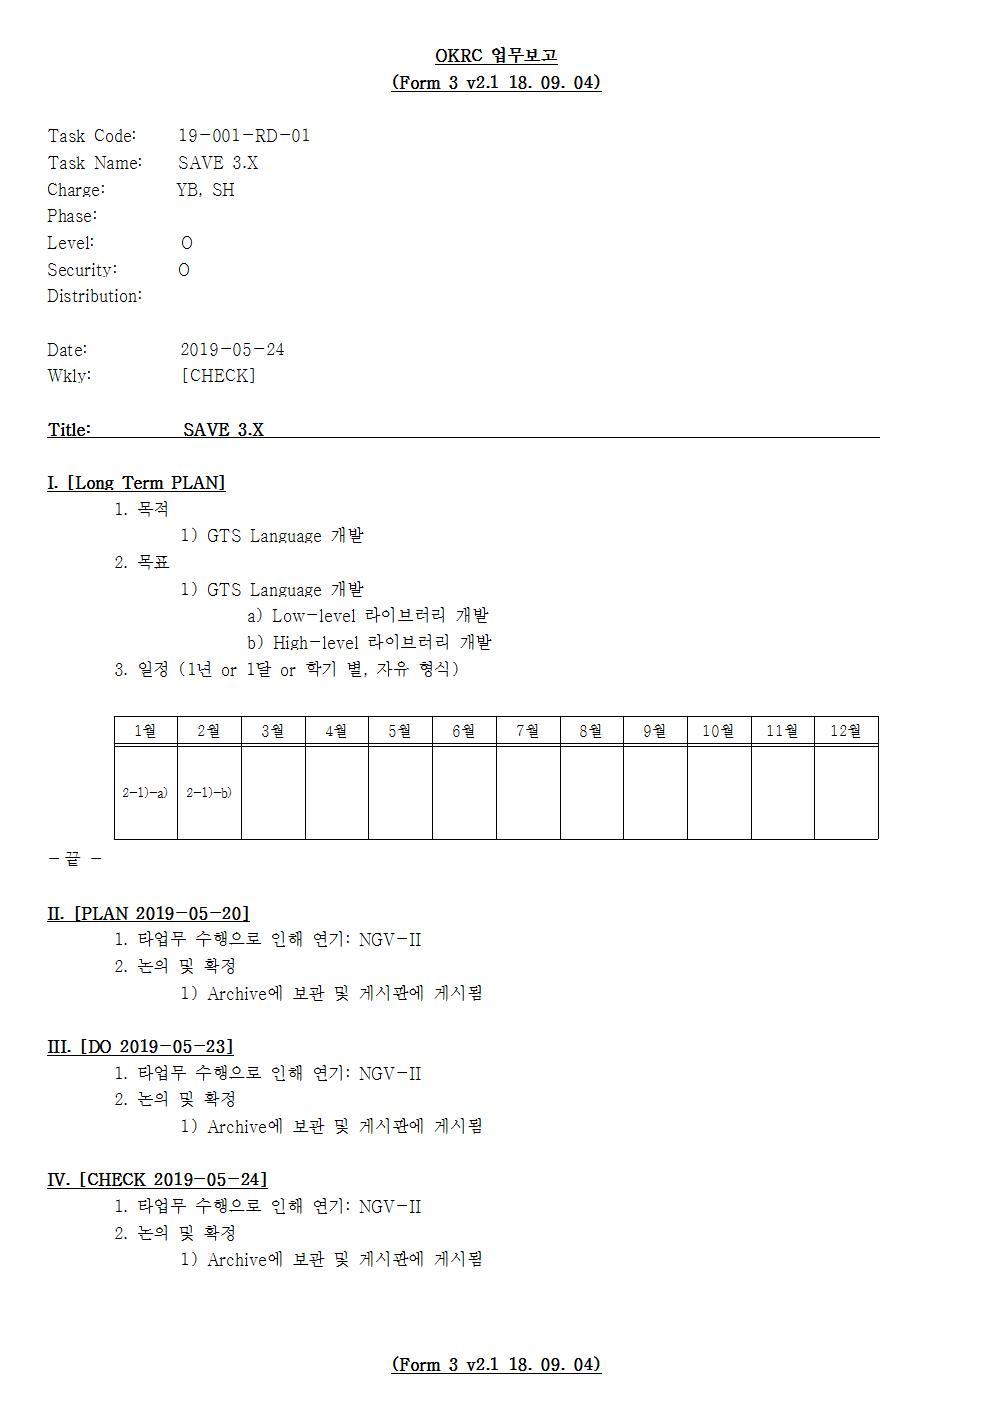 D-[19-001-RD-01]-[SAVE 3.X]-[2019-05-24][SH]-[19-5-4]-[P+D+C]001.jpg